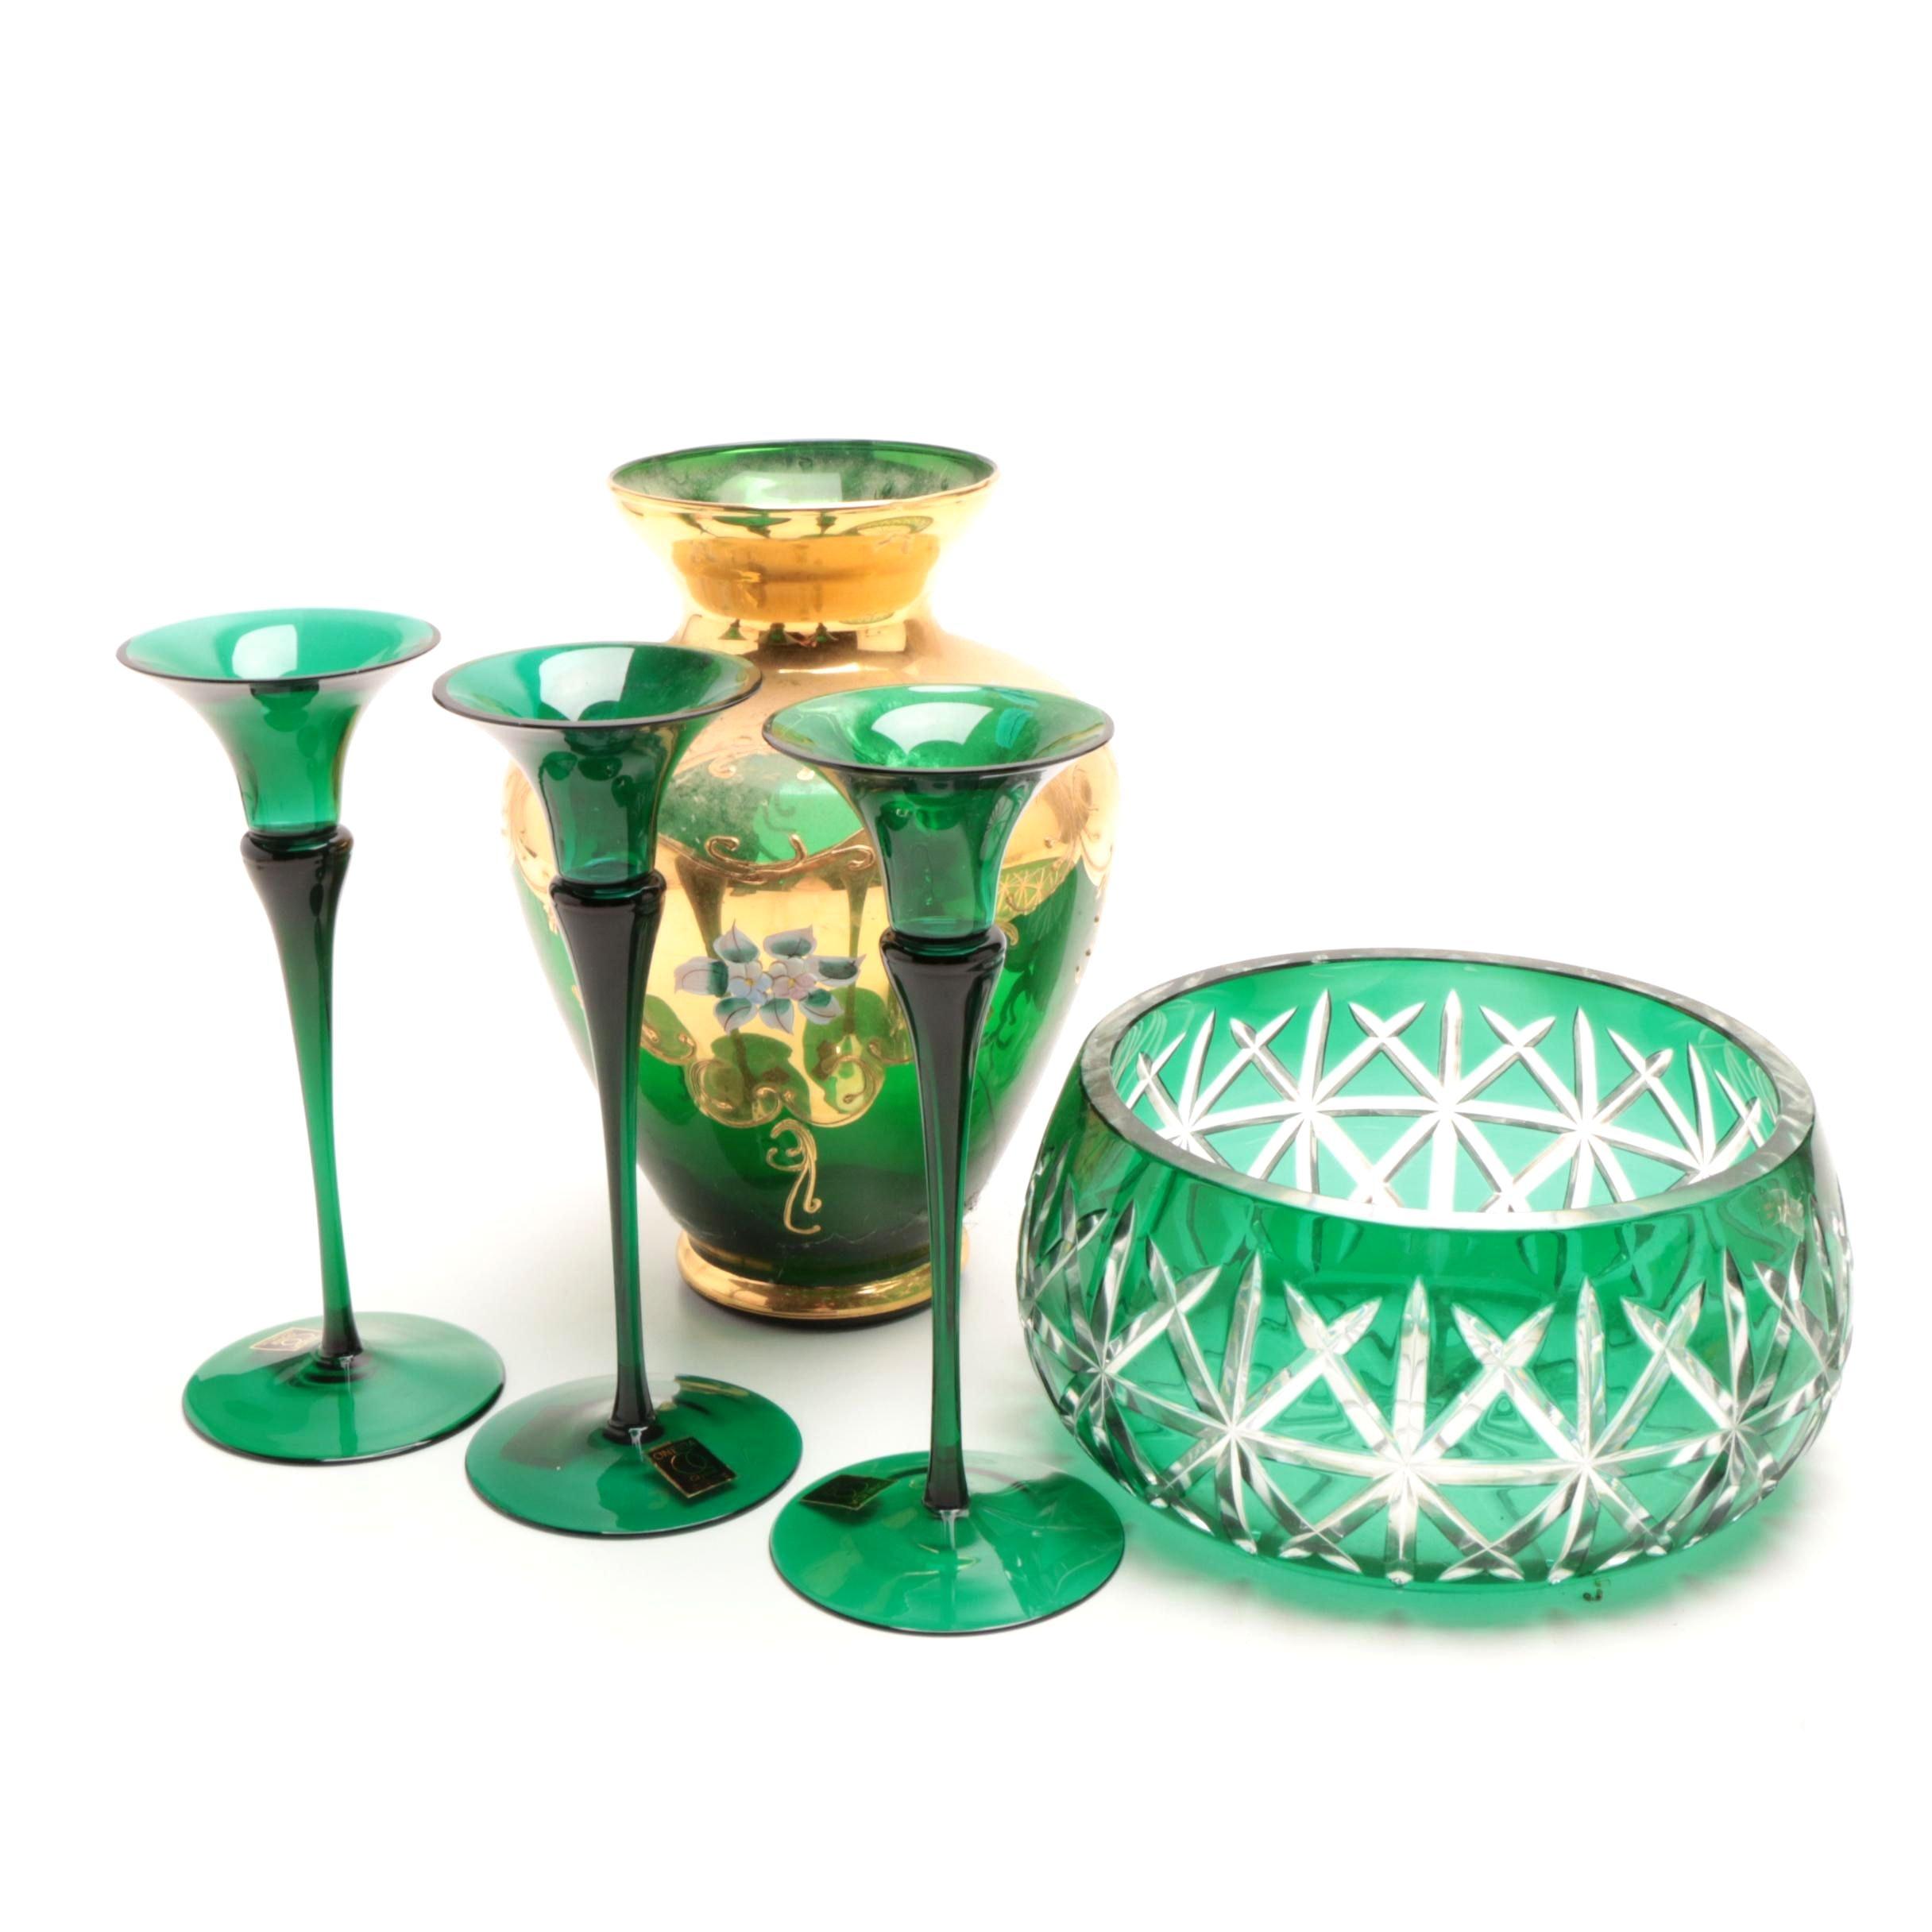 Emerald Green Crystal Bowl, Oneida Candleholders, Gilt Bohemian Vase